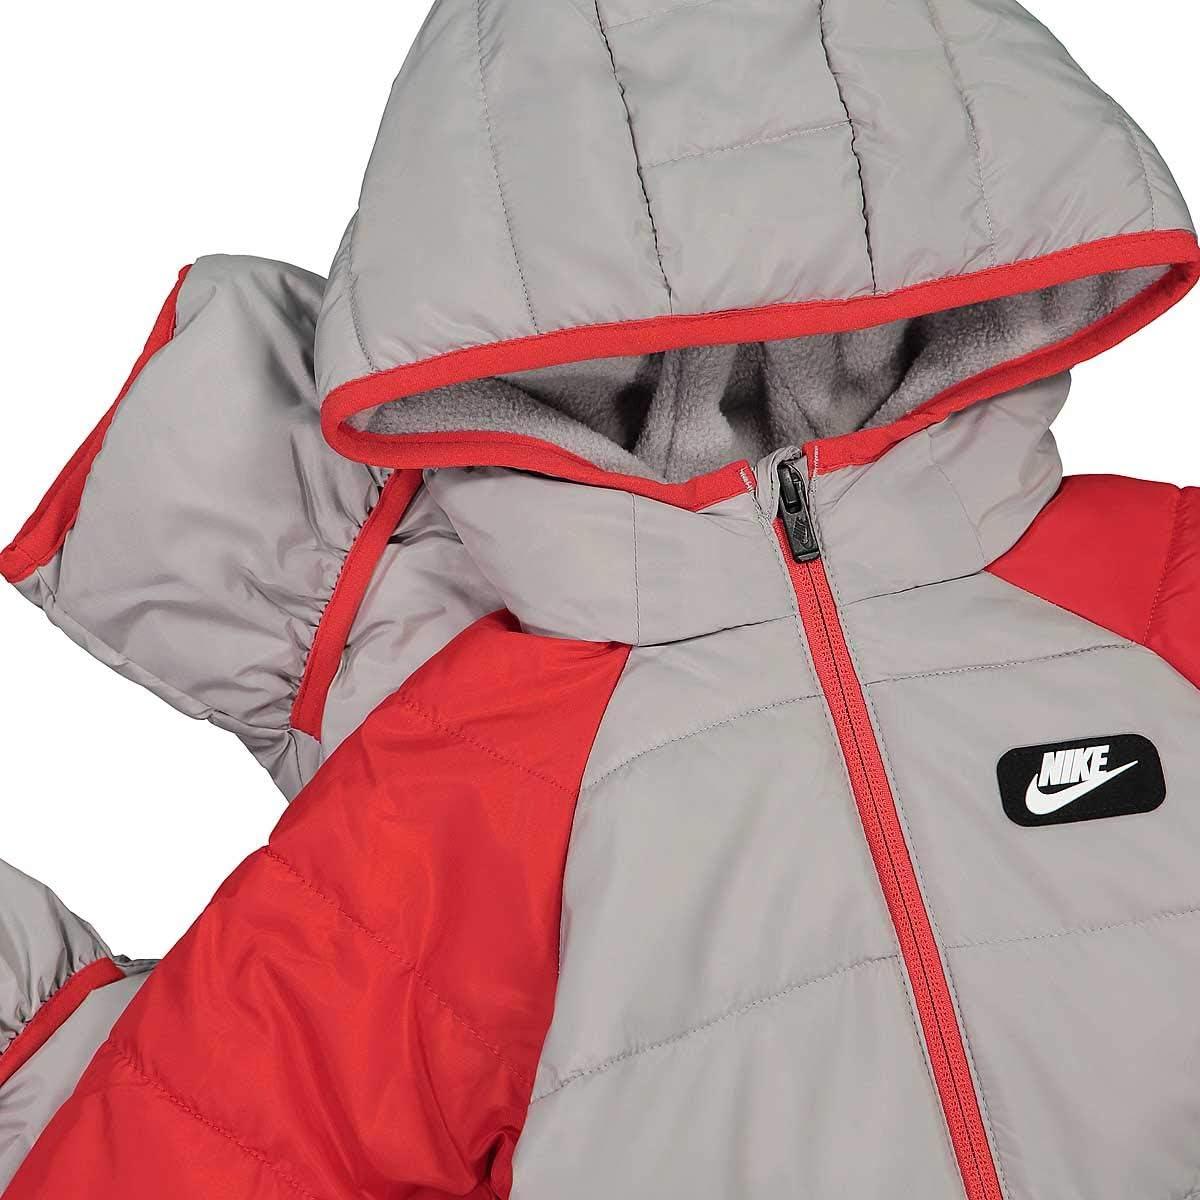 Nike Baby Girls' 1-Piece Snowsuit